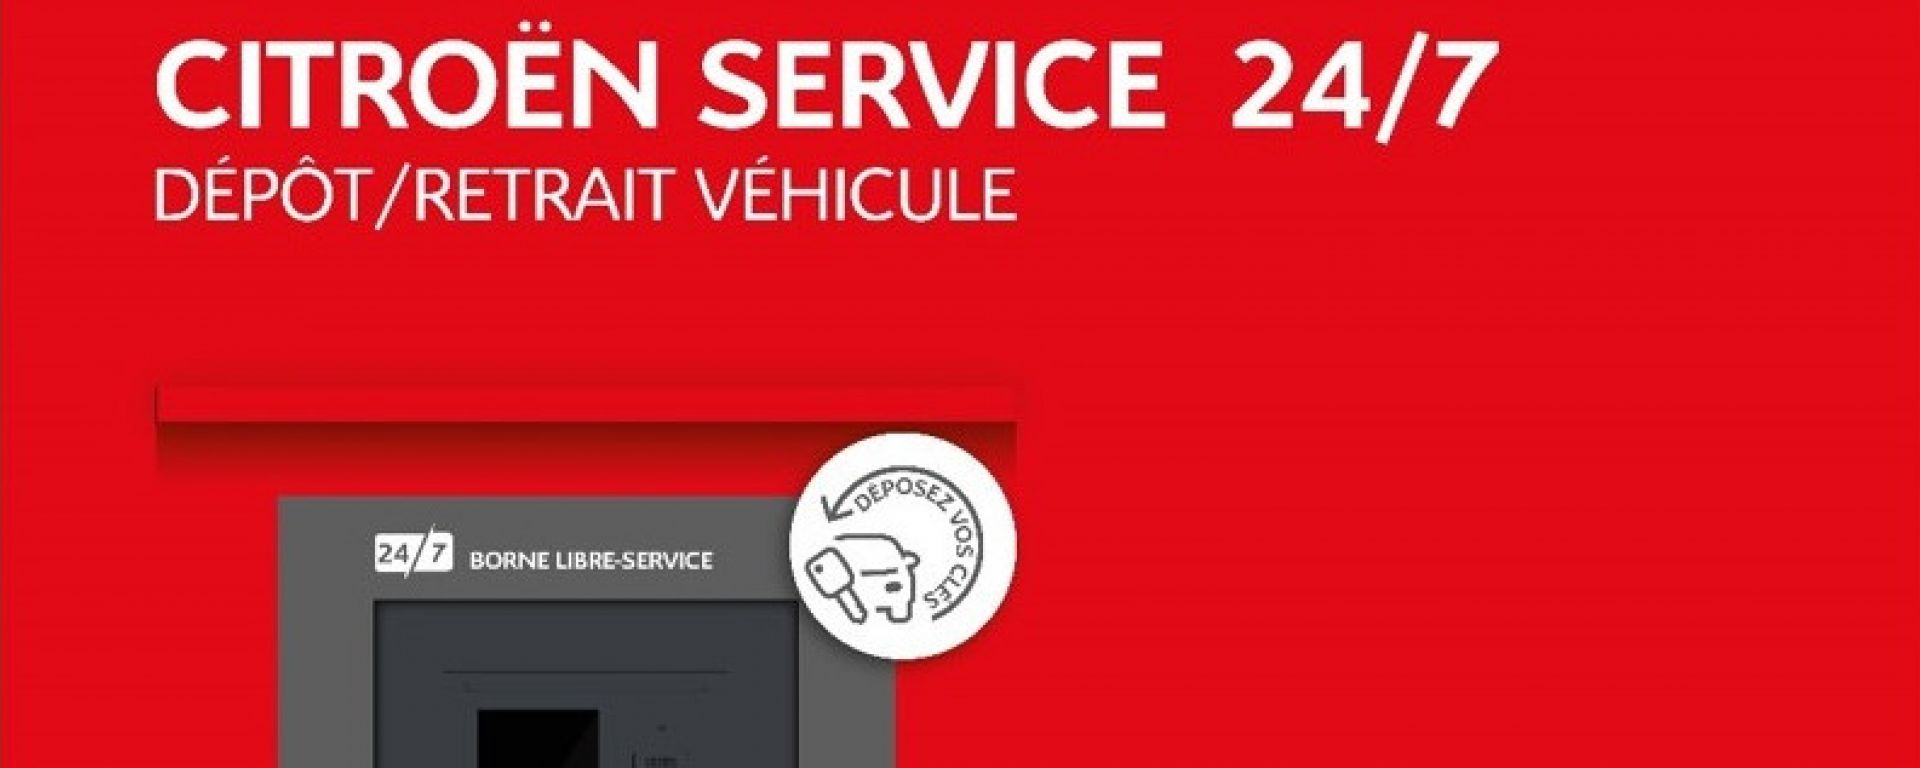 Citroen aftersales service 24/7